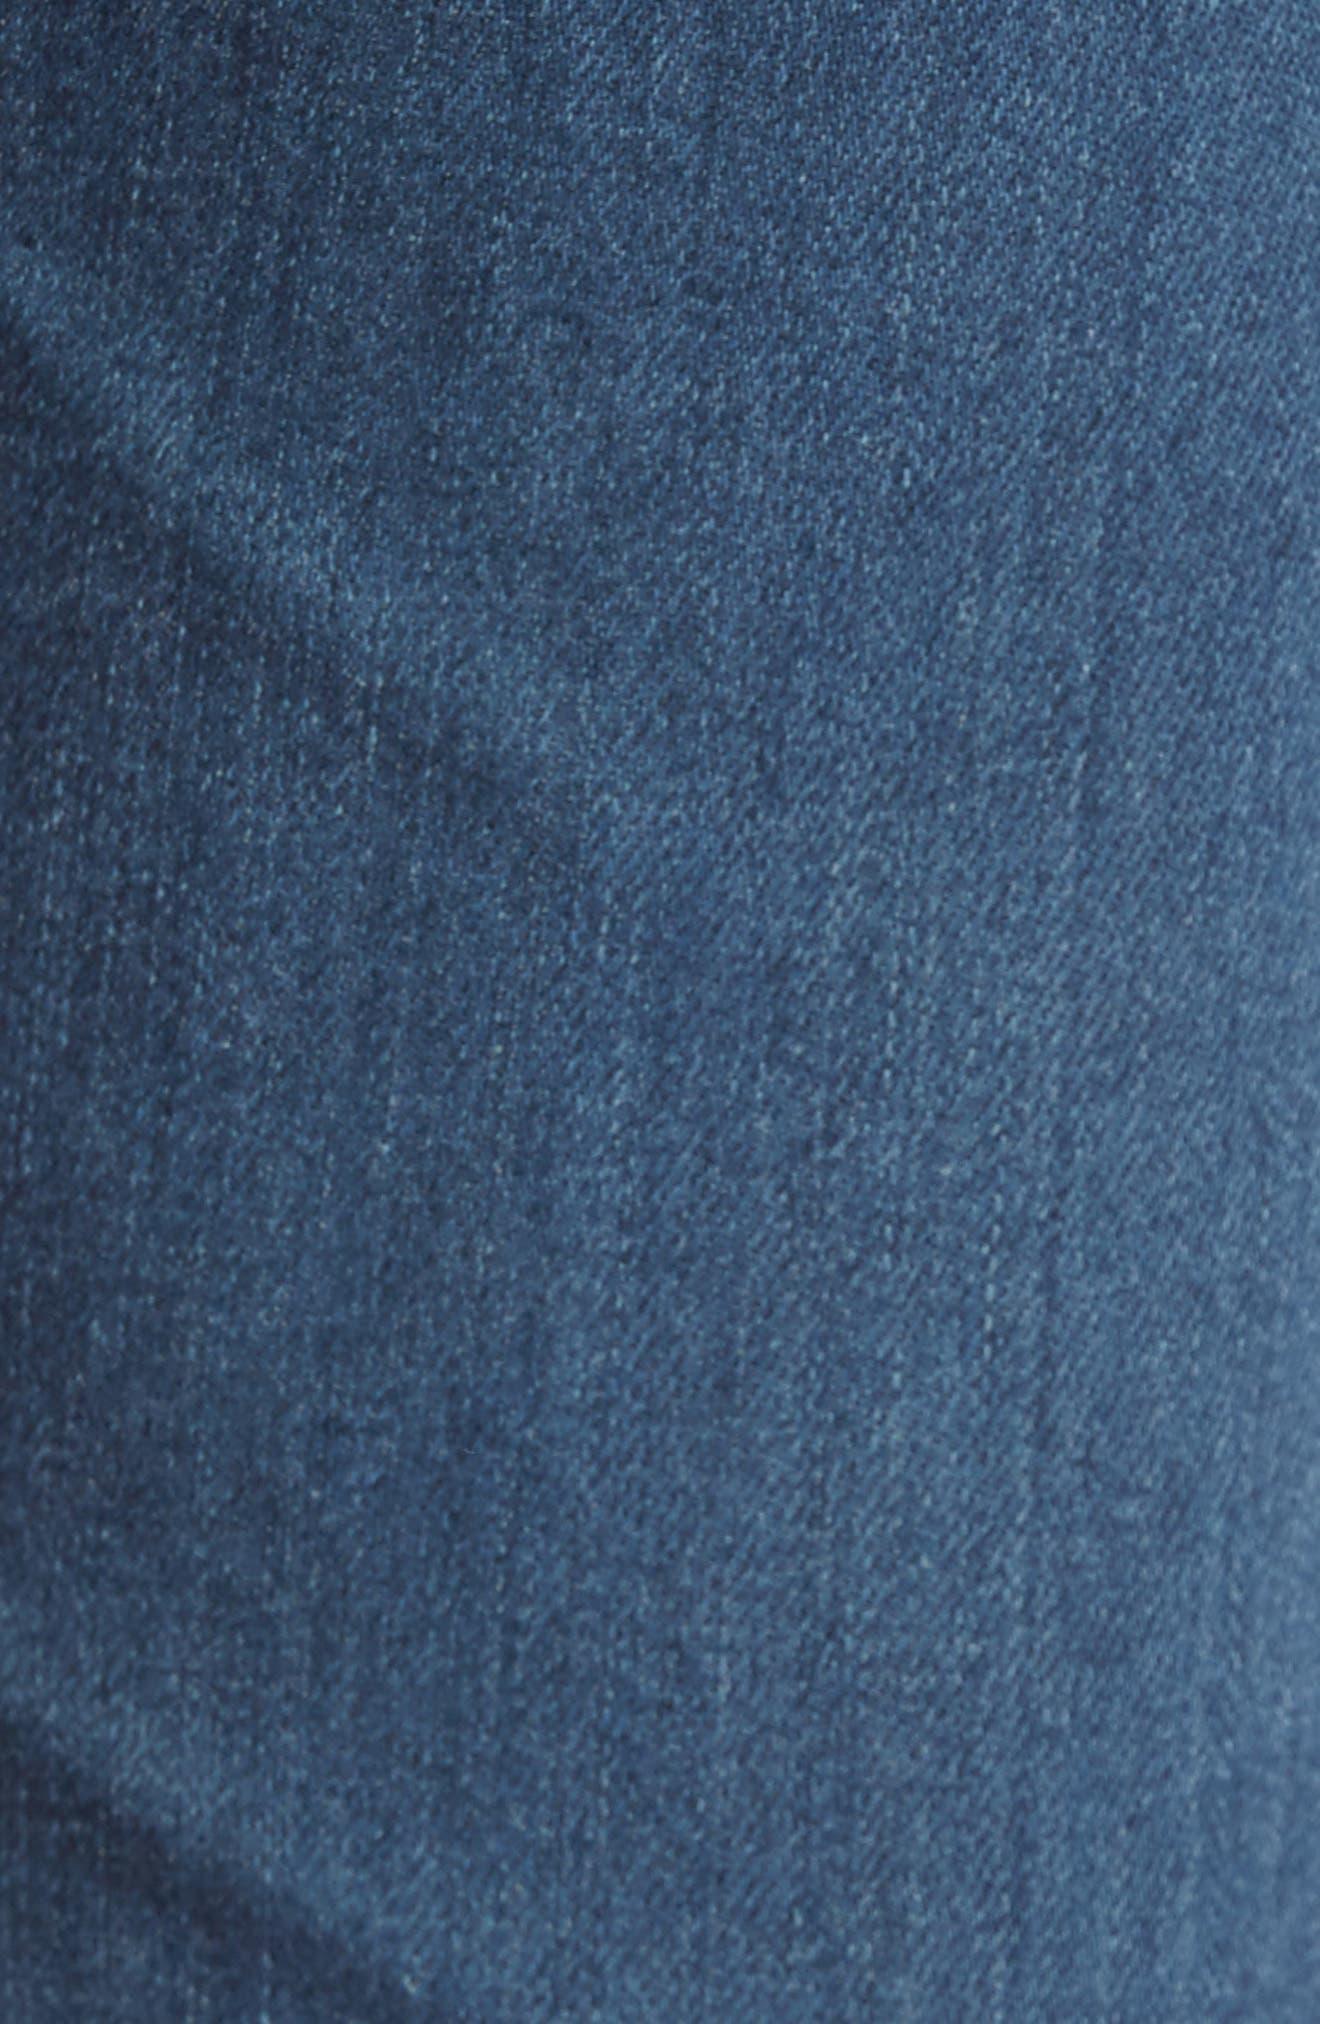 Graduate Slim Straight Leg Jeans,                             Alternate thumbnail 9, color,